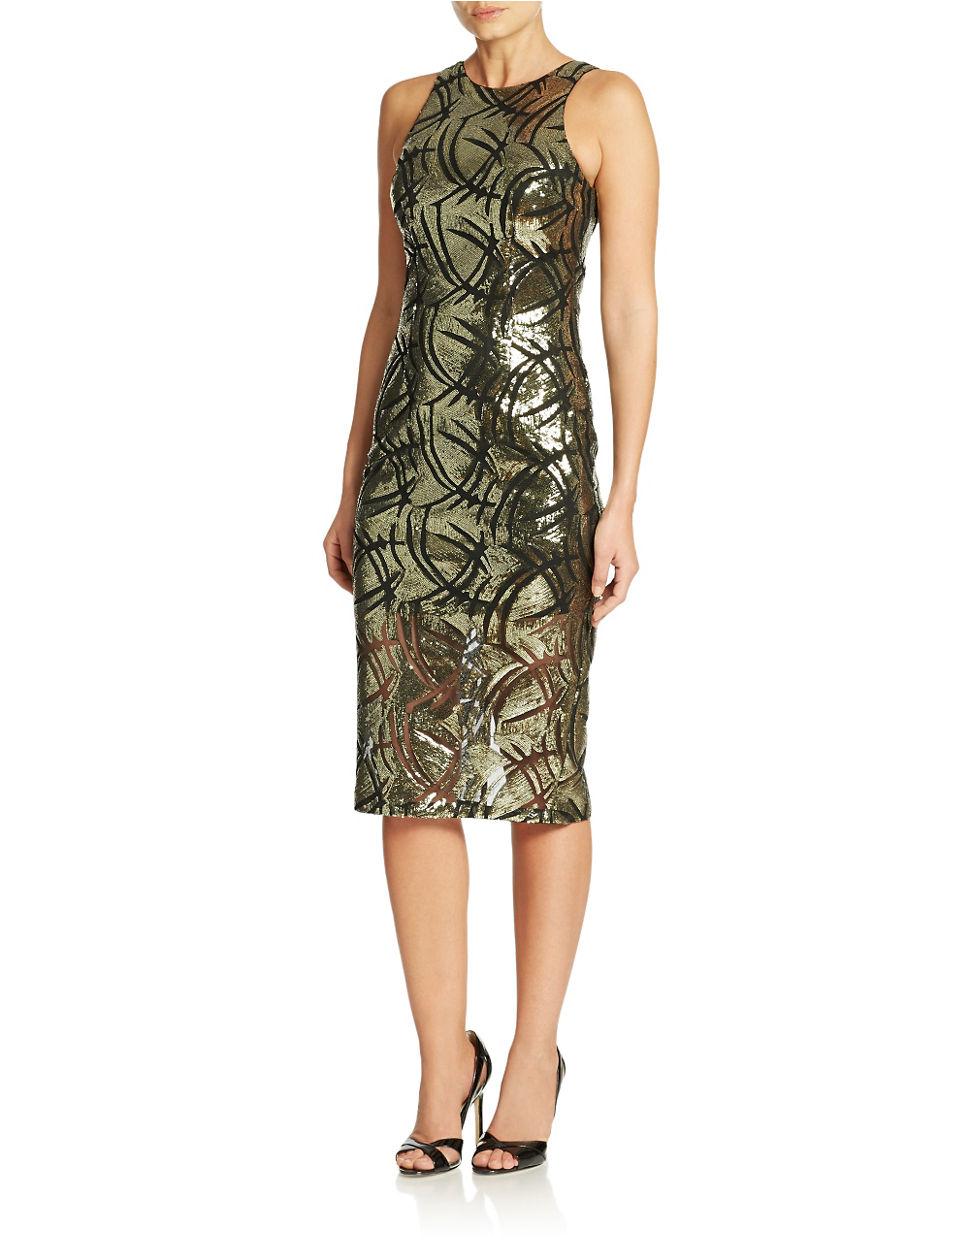 00d65141 Lyst - Alexia Admor Lace Illusion Hem Sheath Dress in Black